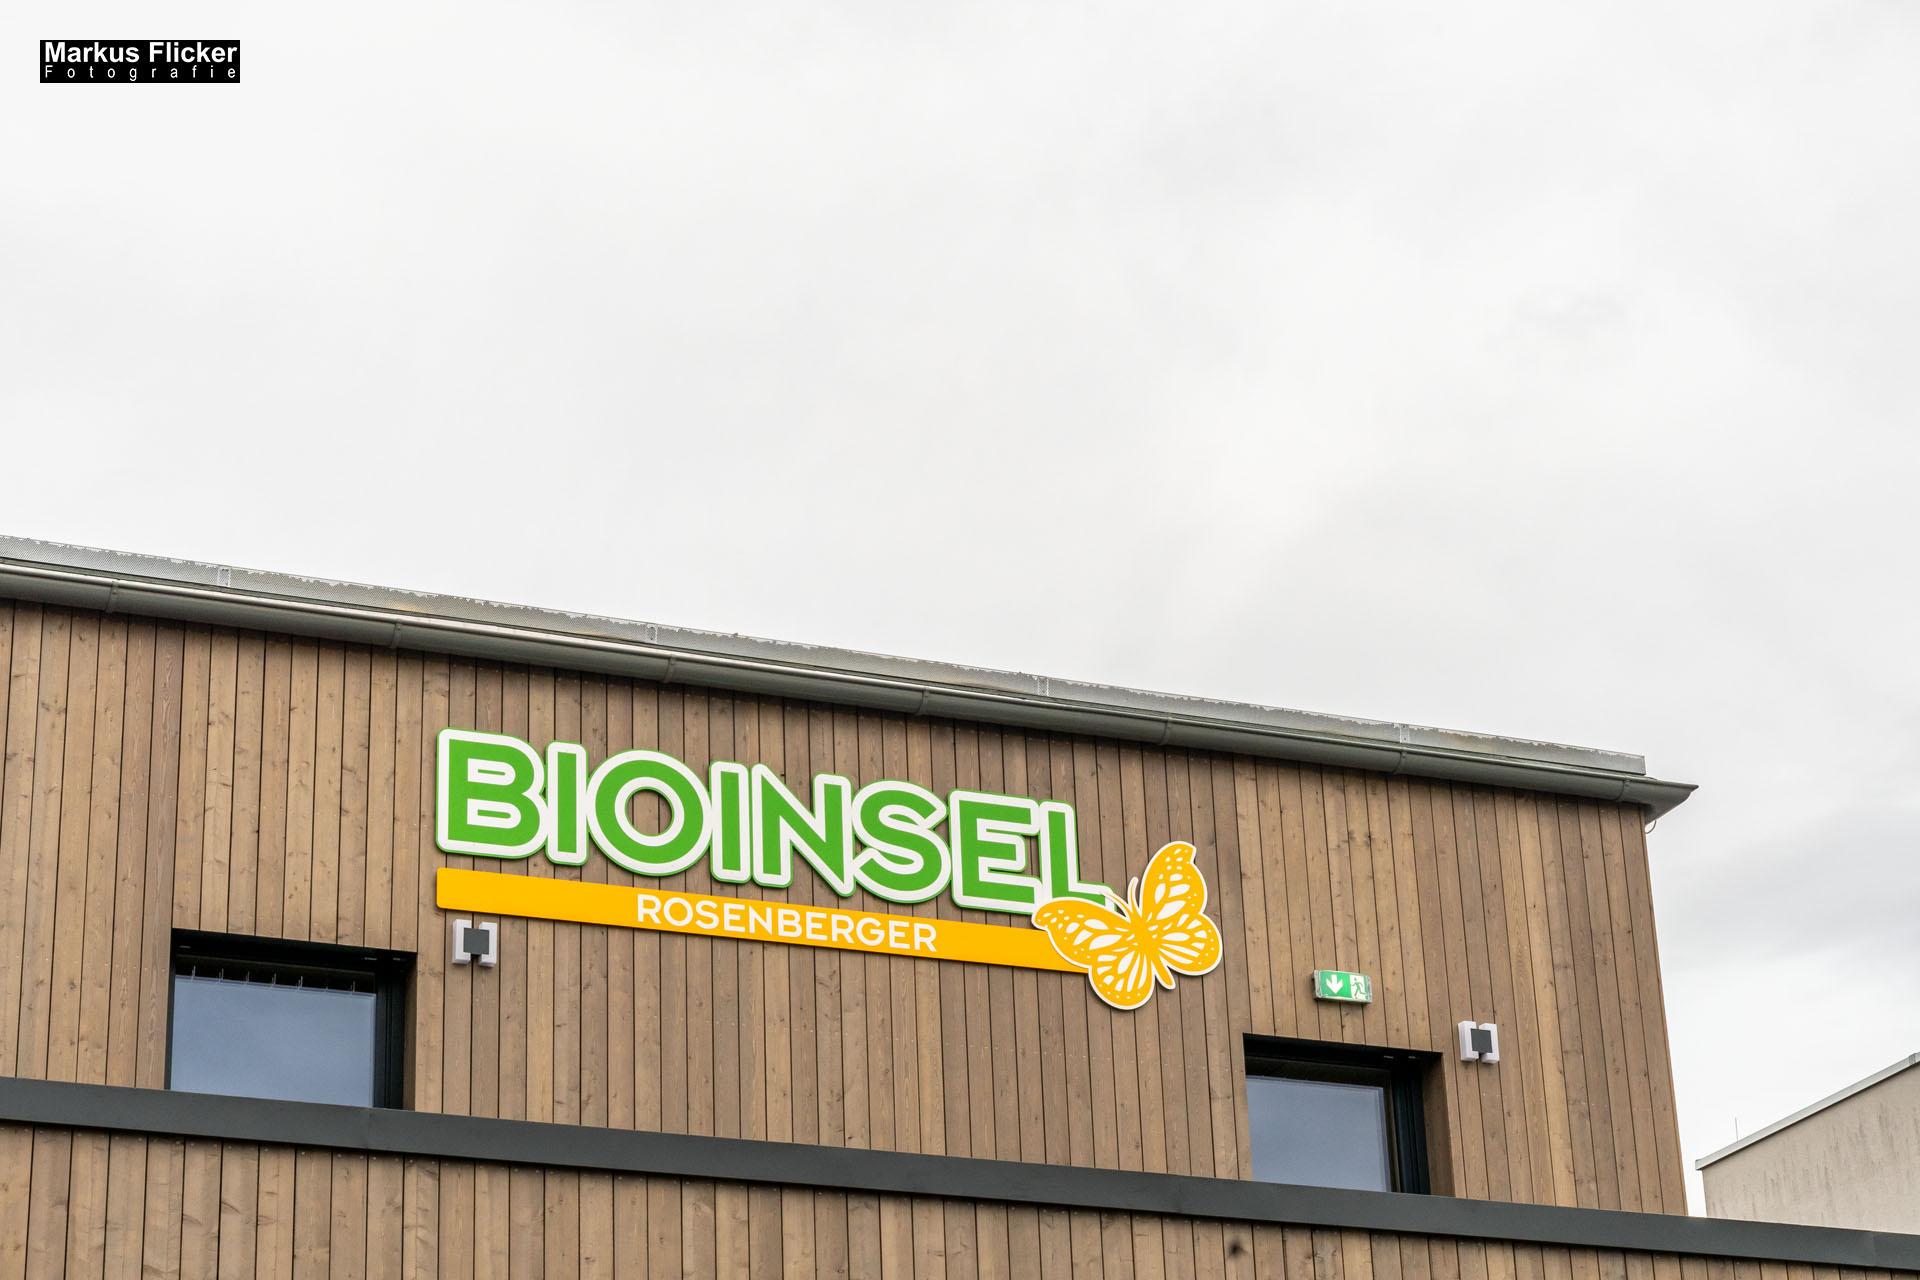 Bioinsel Rosenberger in Weiz